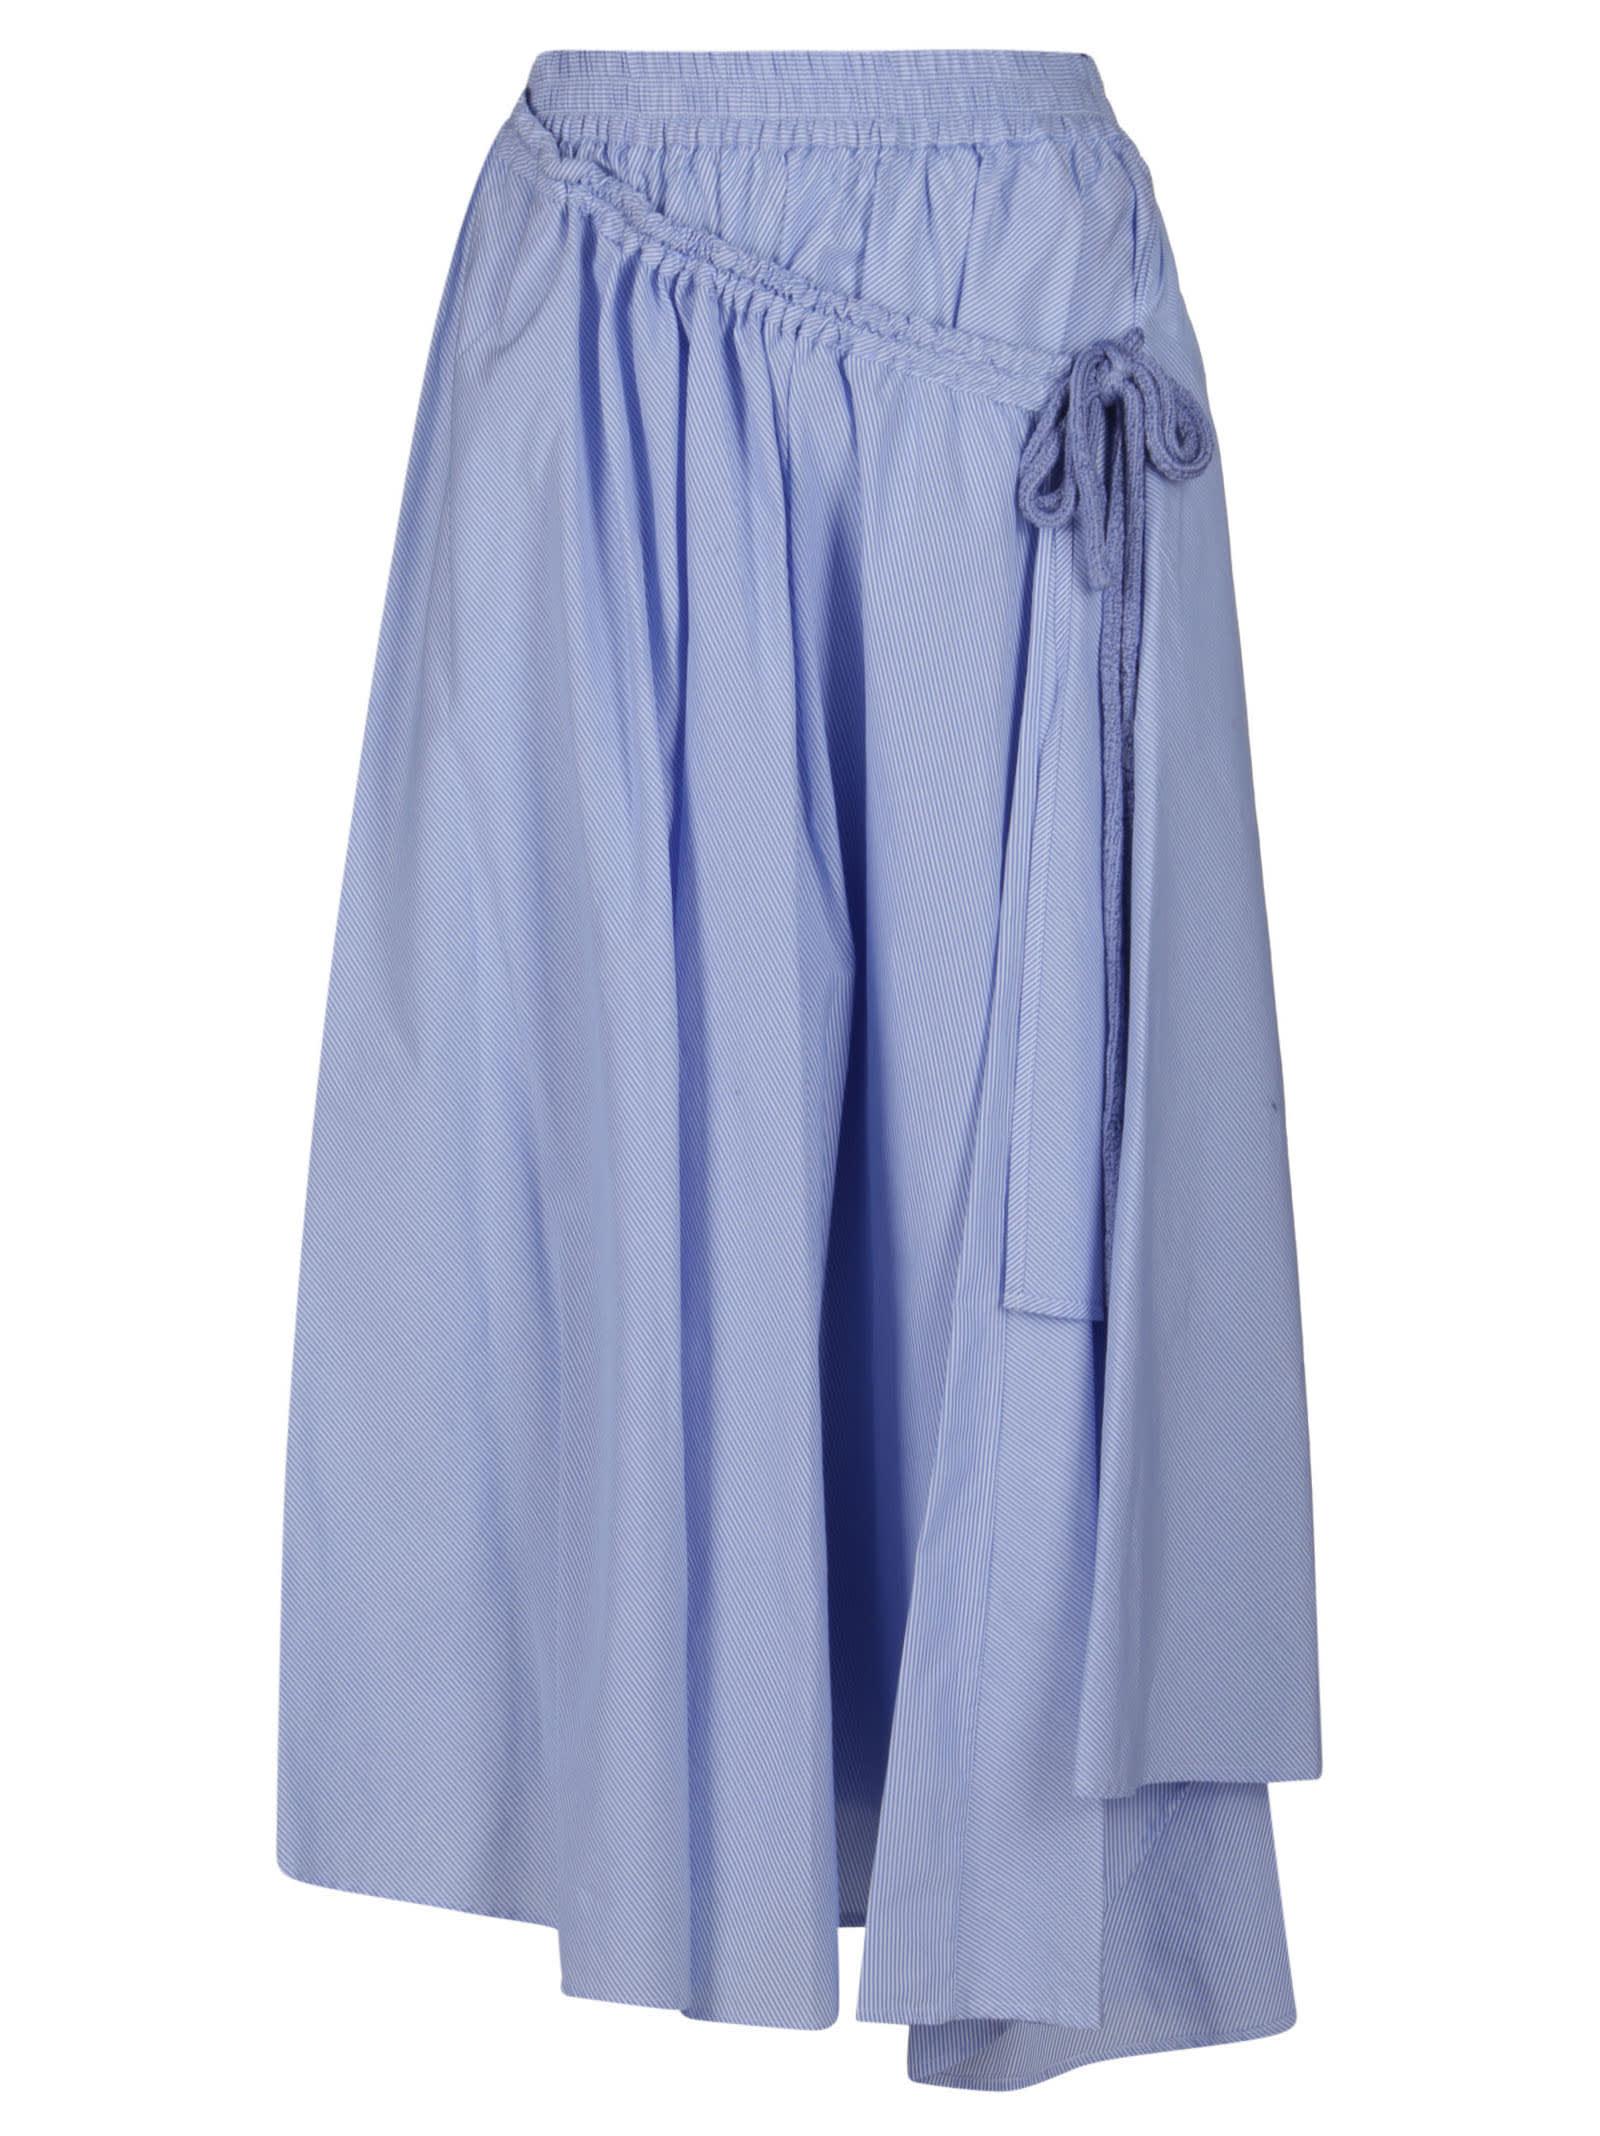 Maison Flaneur Light Blue Cotton Skirt